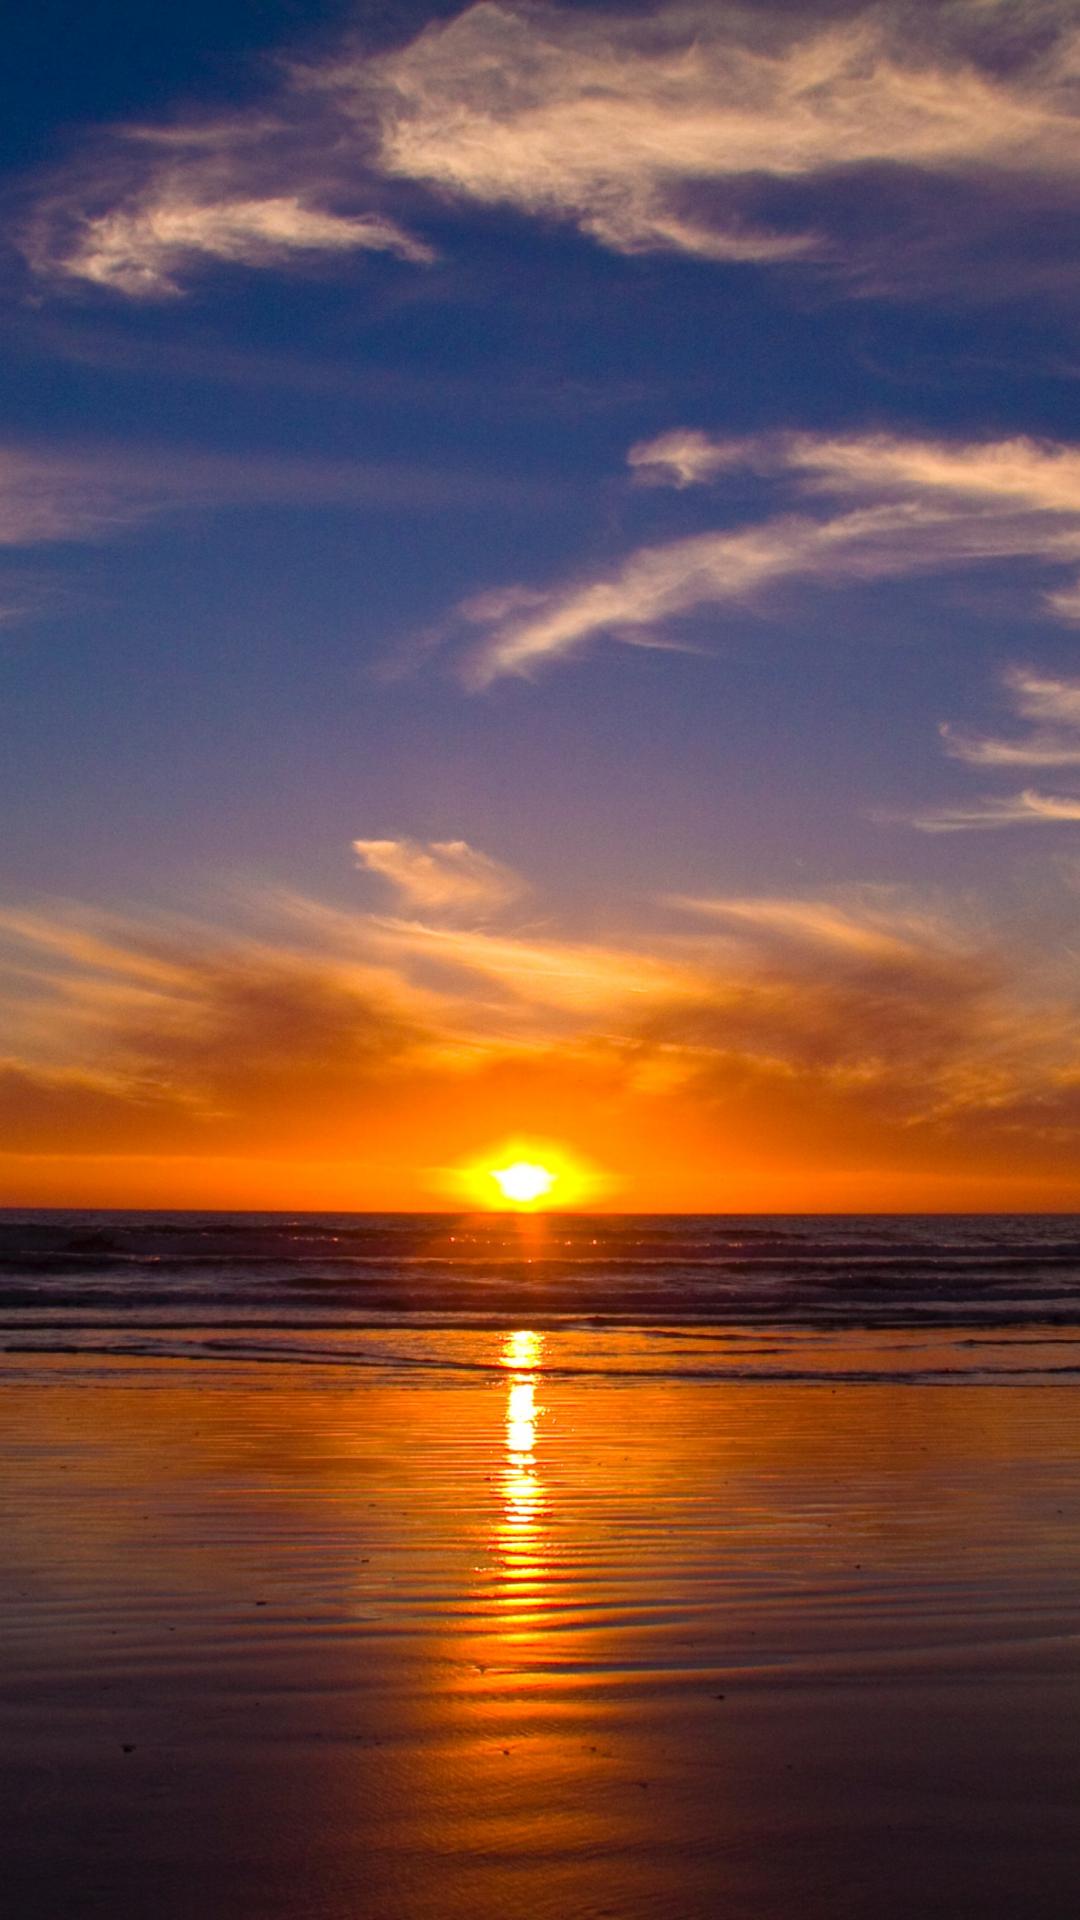 Cape Town Sunset iPhone Wallpaper